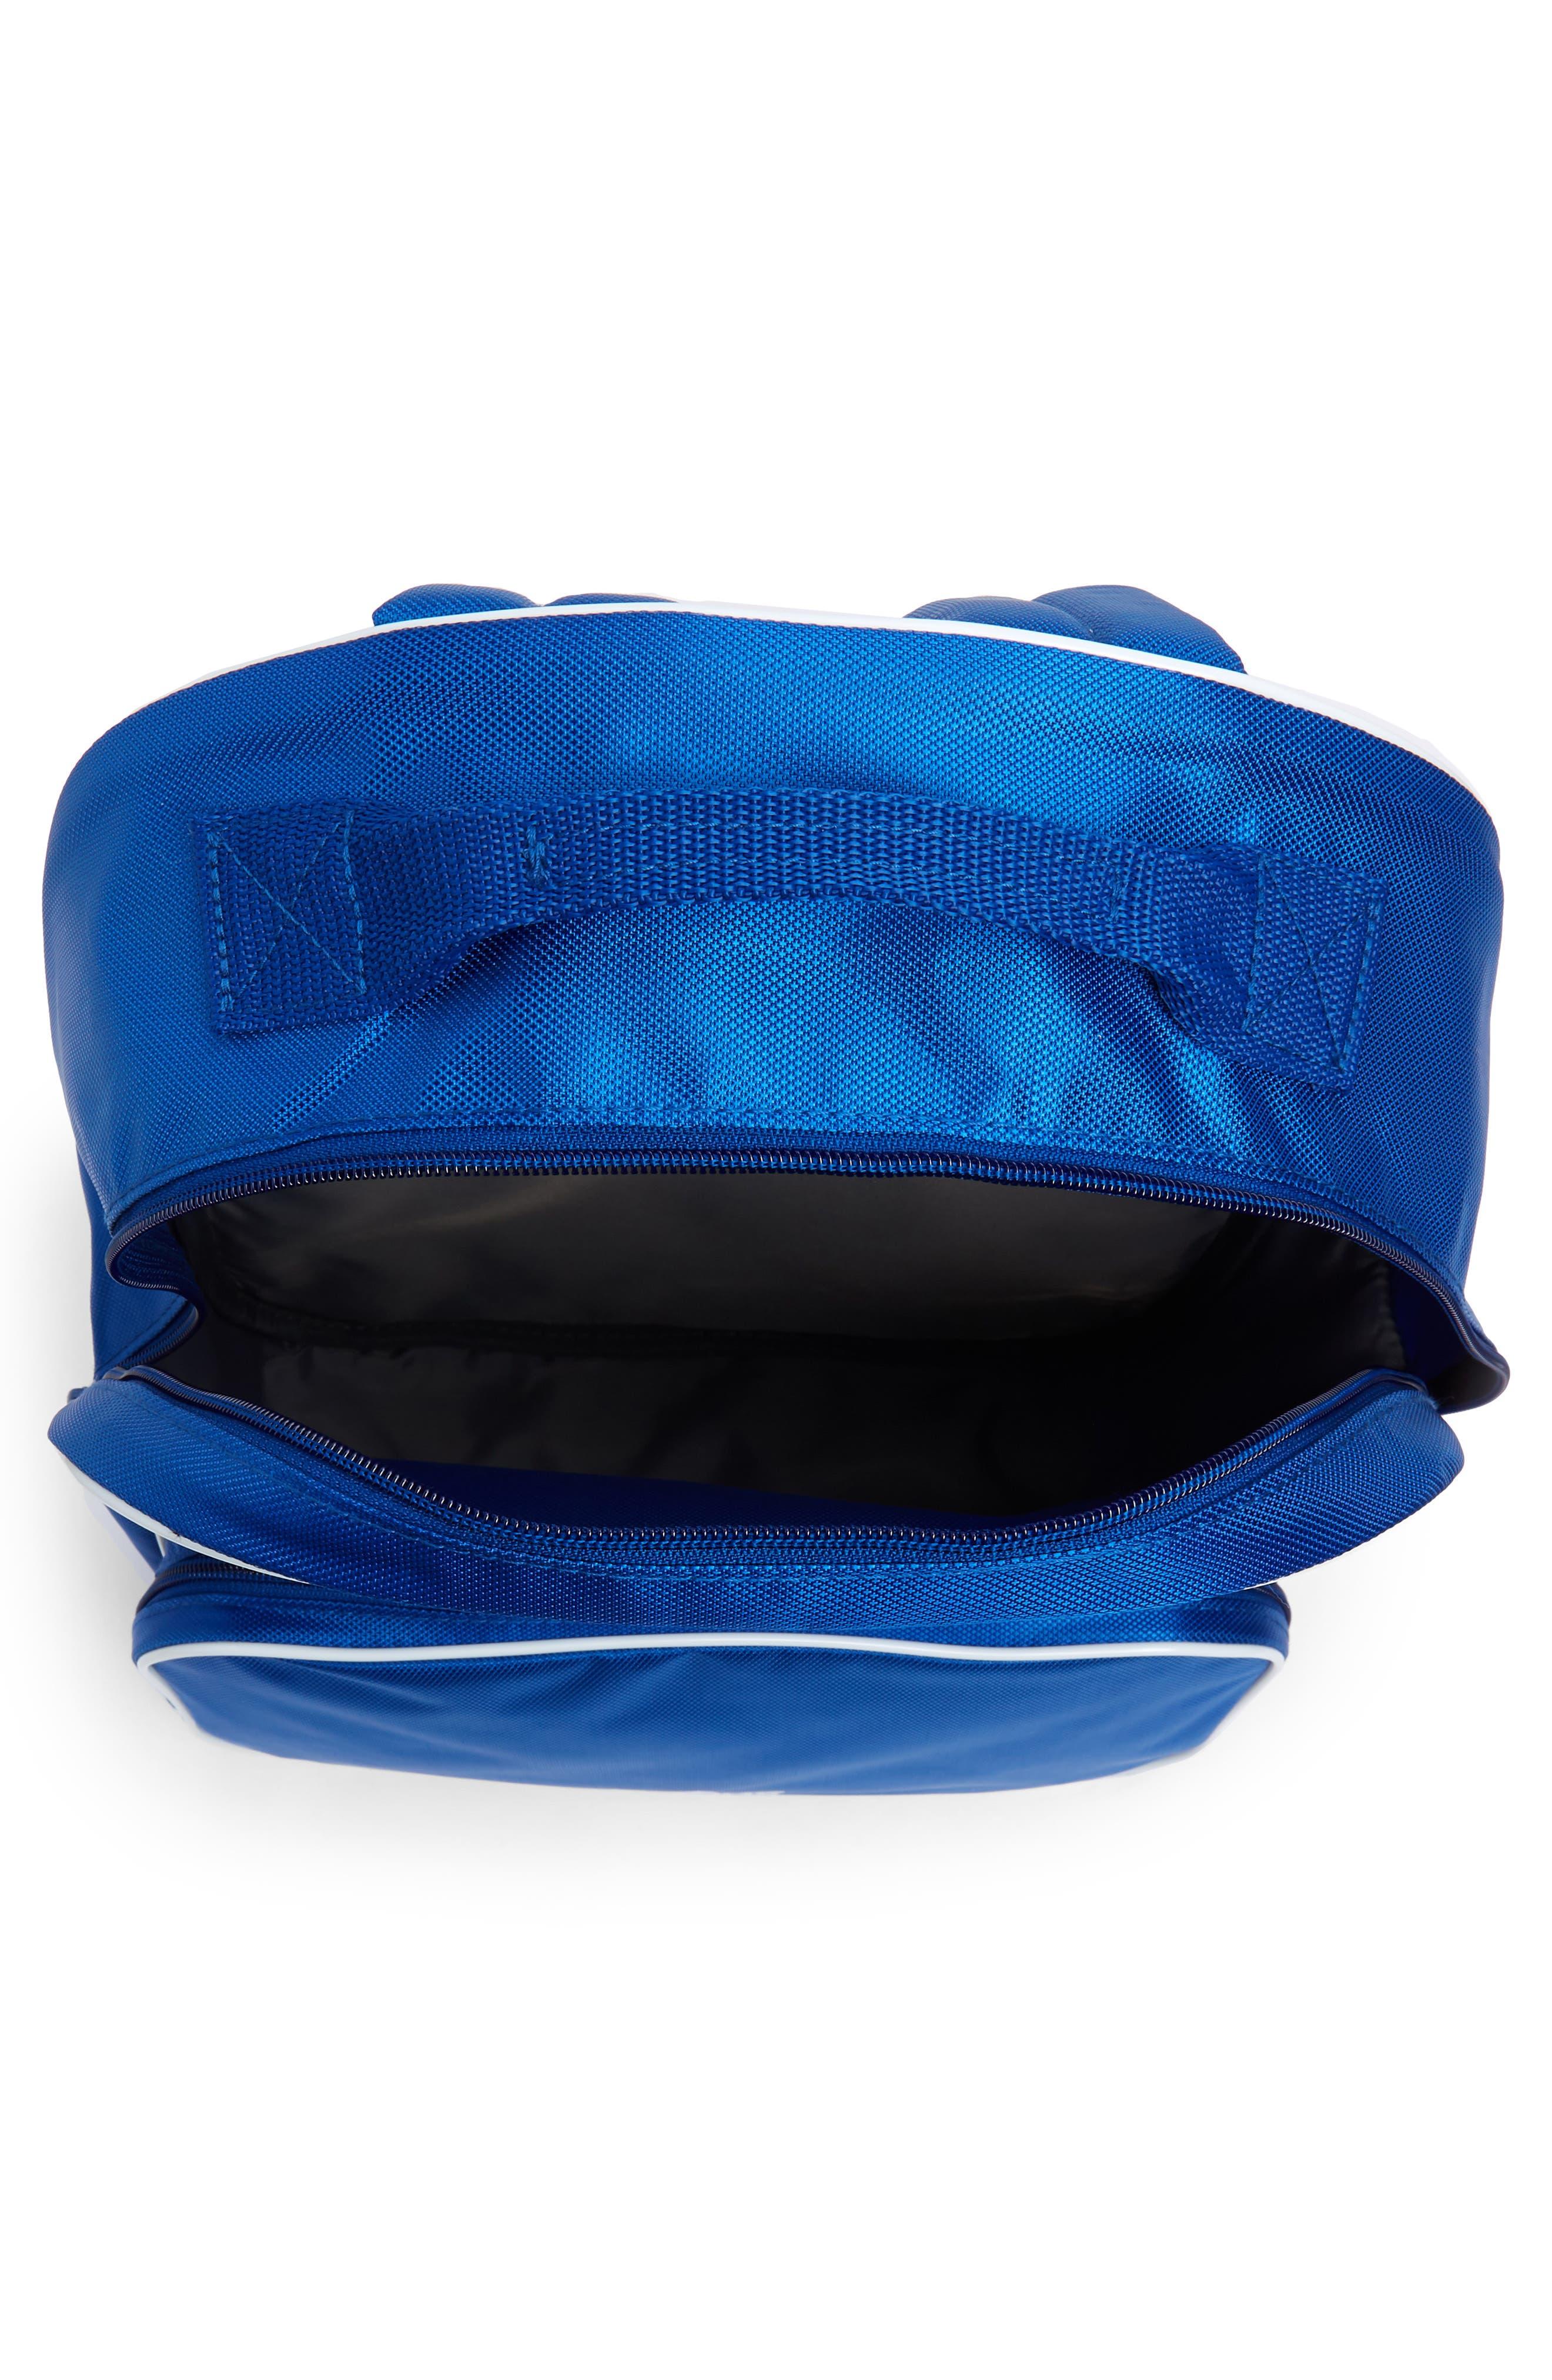 Originals Santiago Backpack,                             Alternate thumbnail 3, color,                             COLLEGIATE ROYAL BLUE